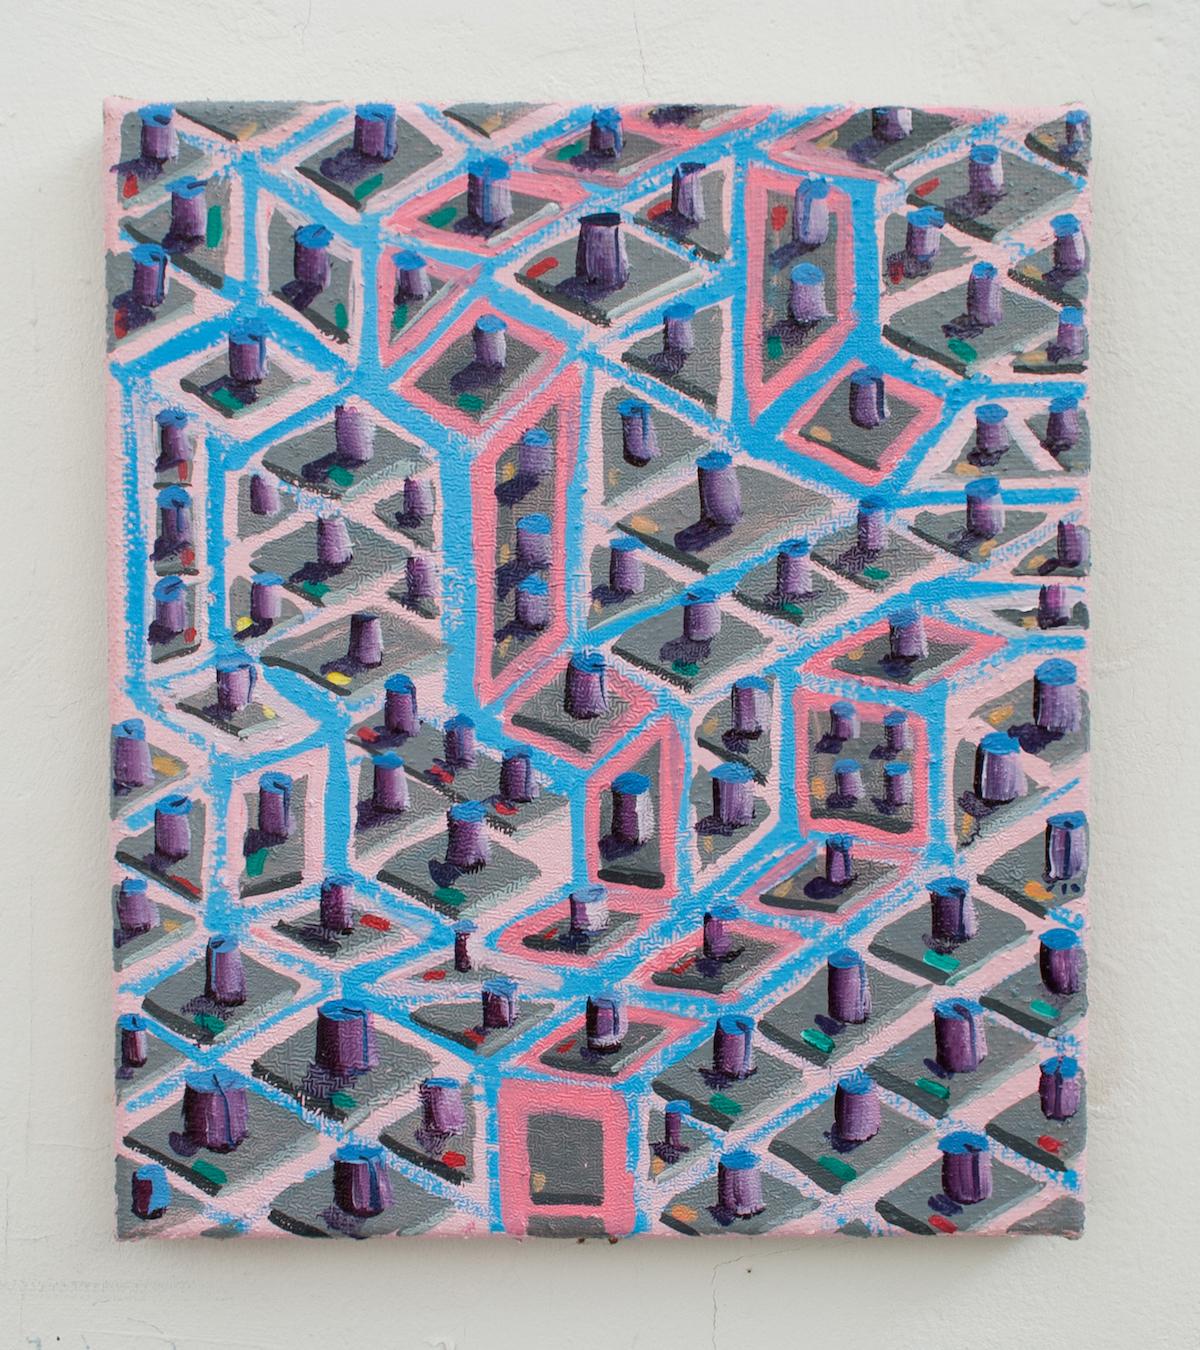 Switch Island. Michael Coppelov. Jackson's Painting Prize 2020.